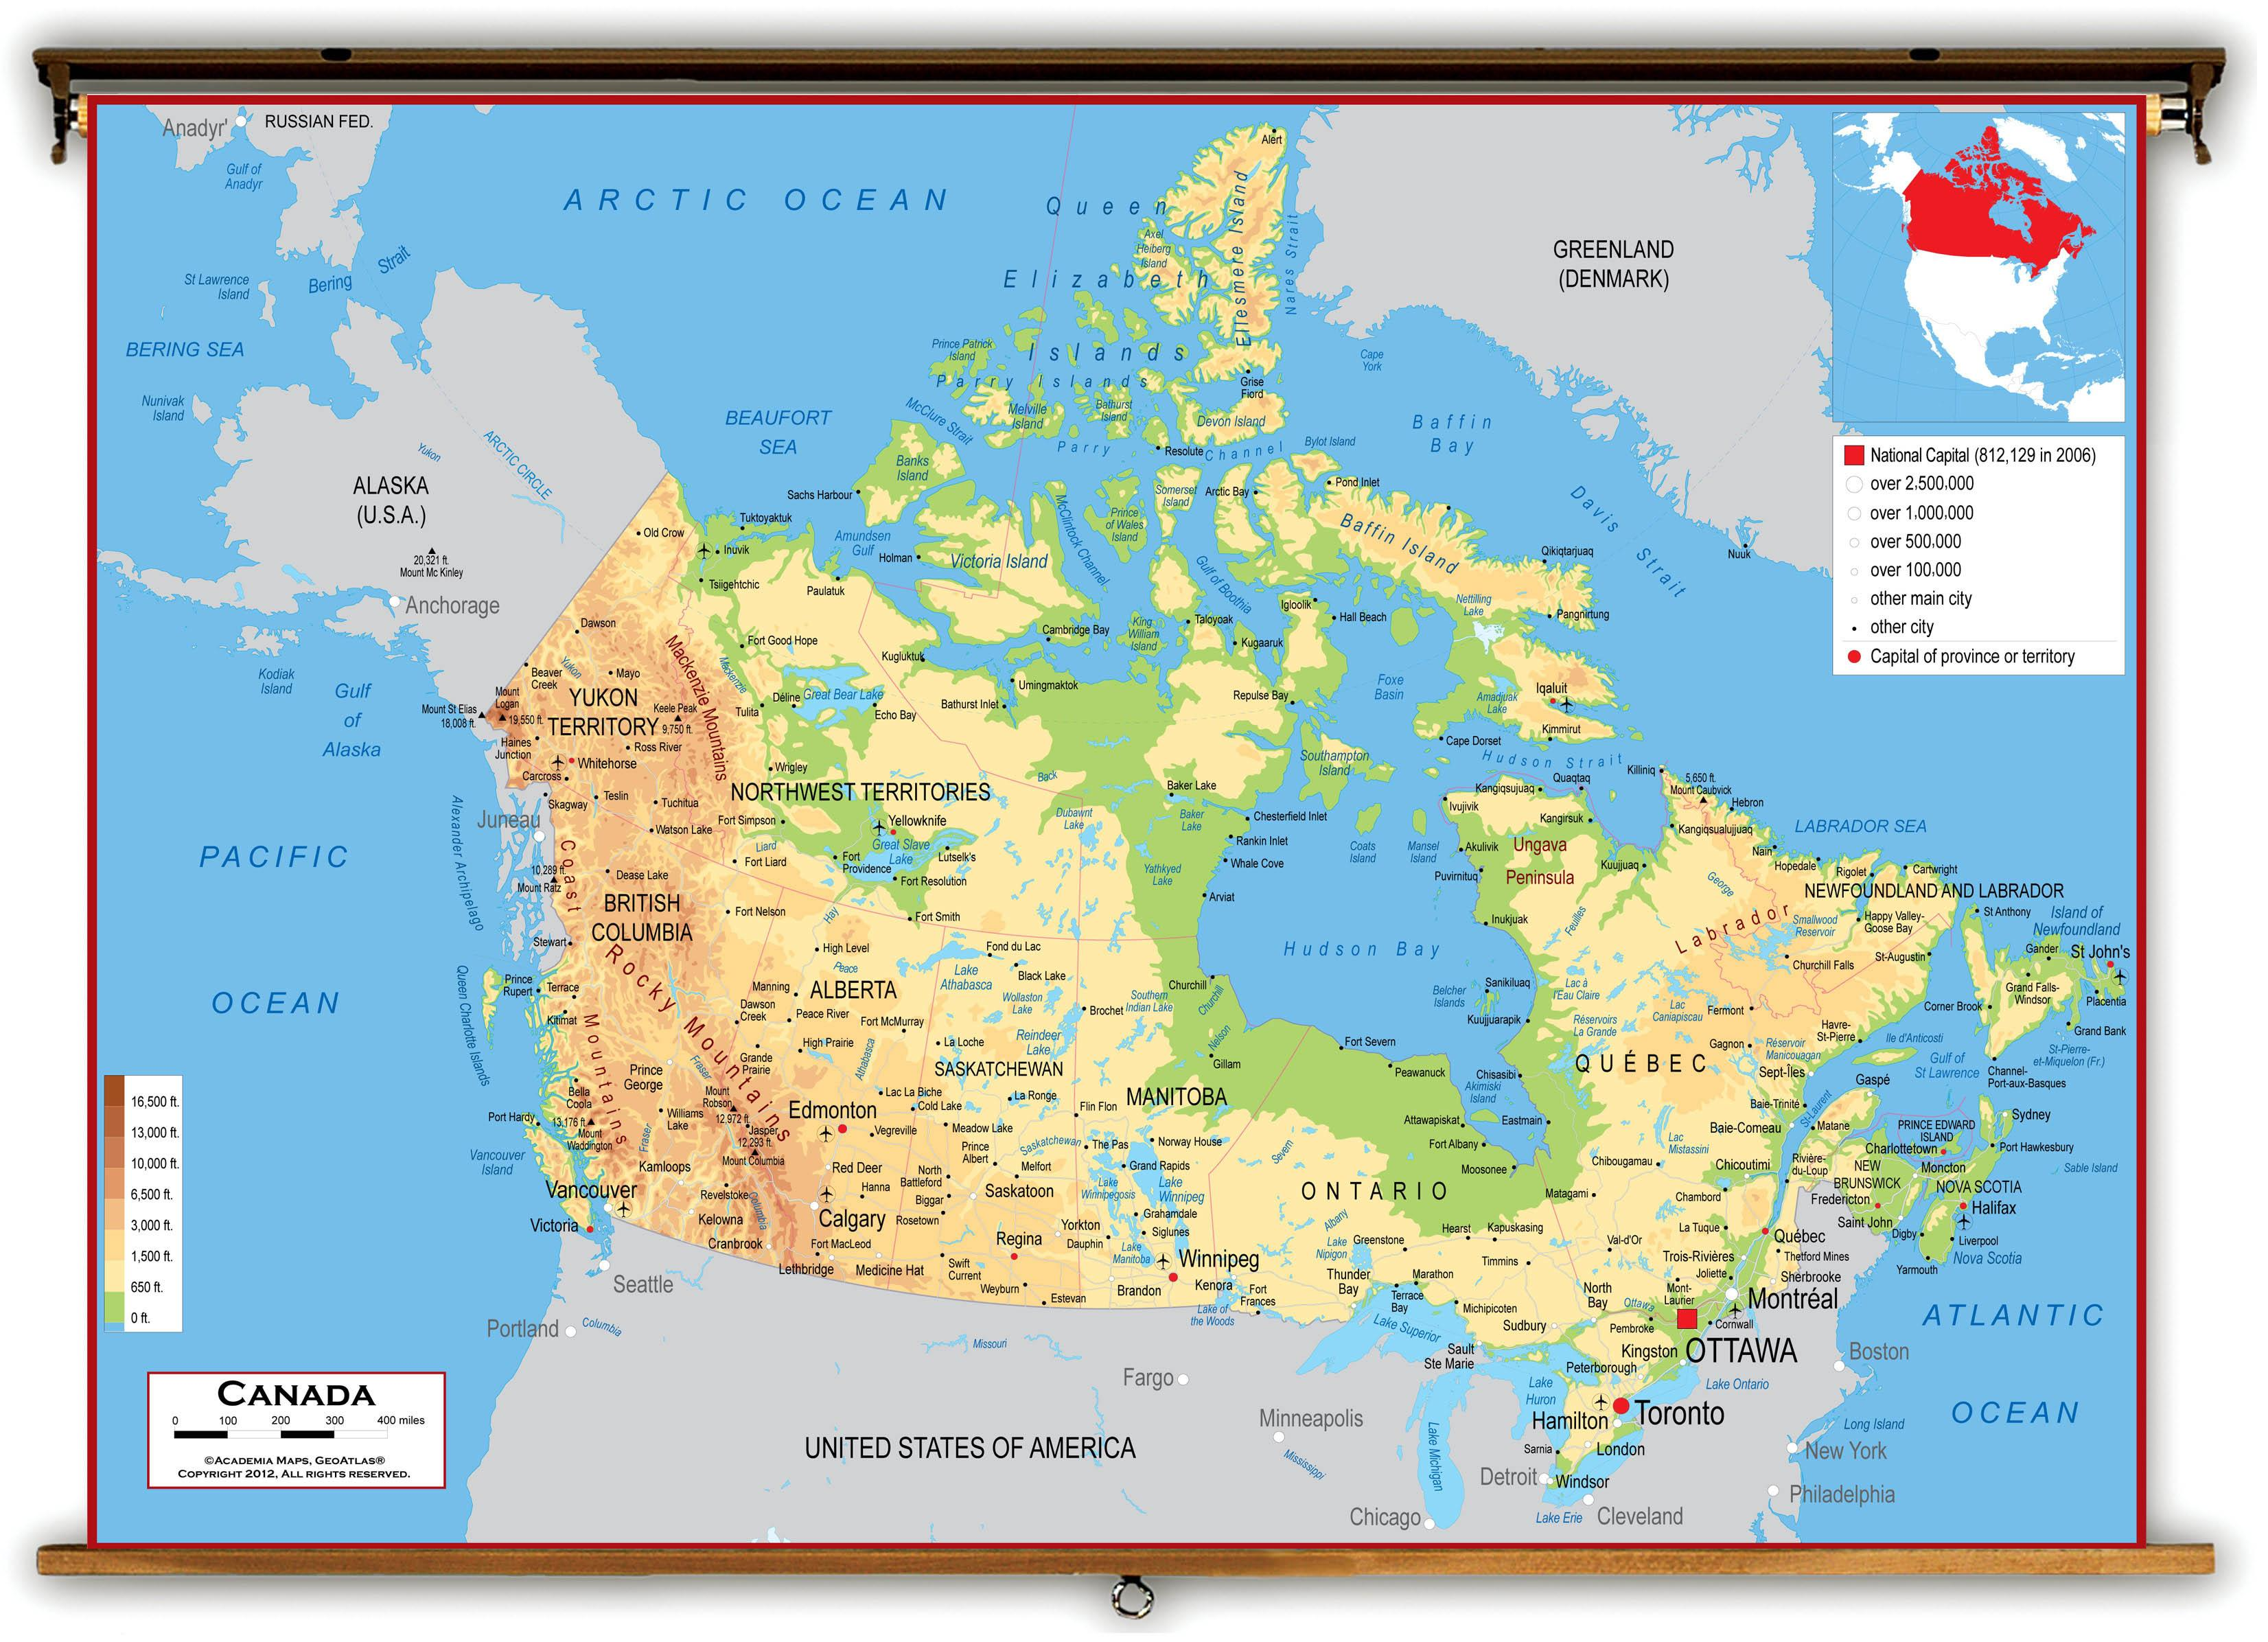 canada kart West coast Canada kart   Kart over Canada vestkysten (Nord Amerika  canada kart